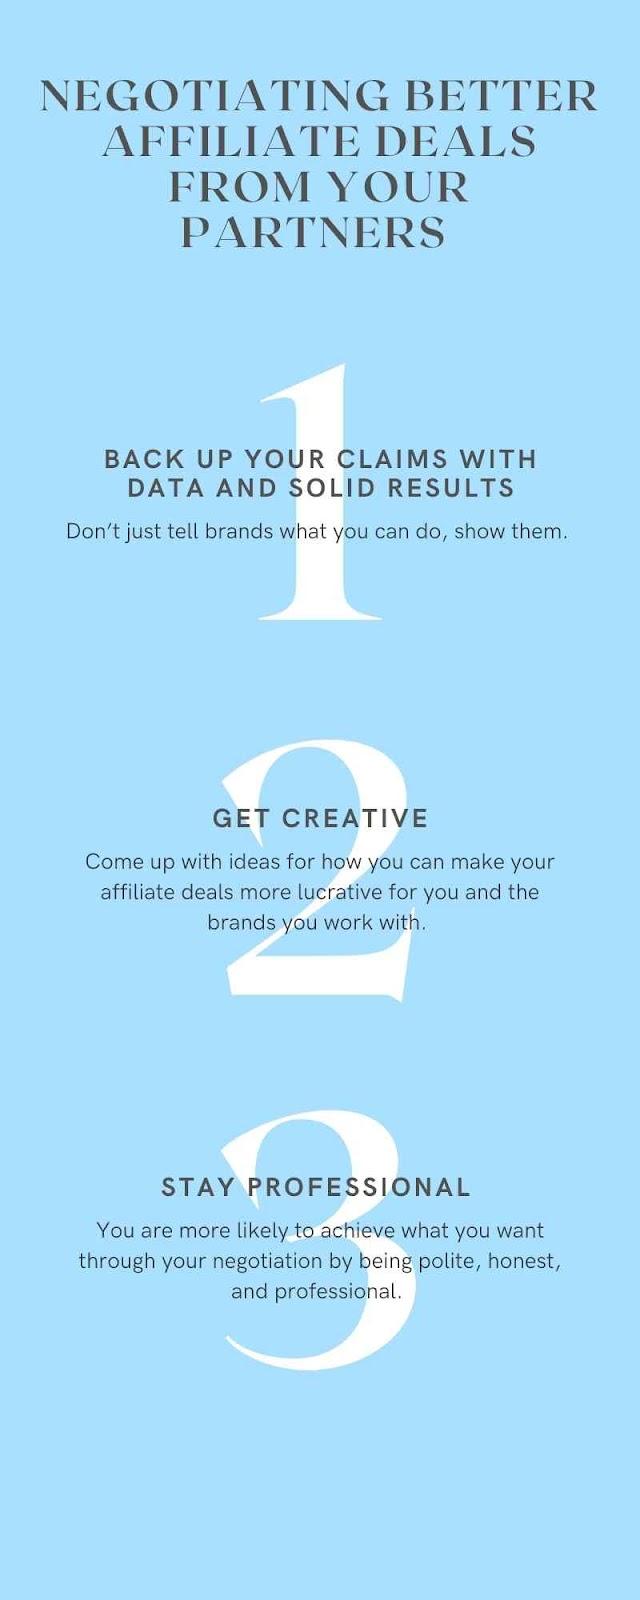 negotiating better affiliate deals infographic